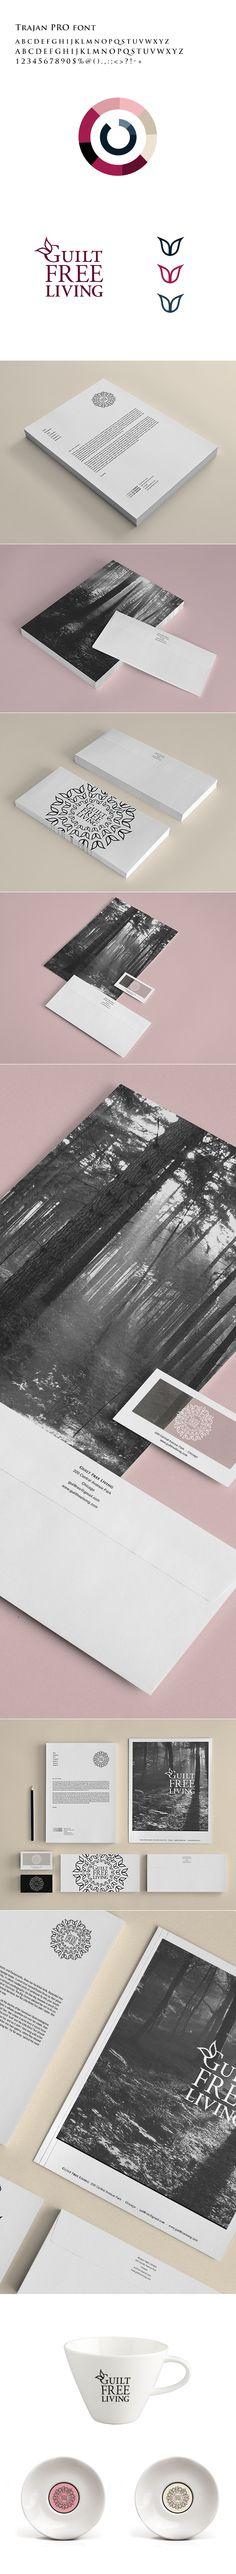 Guilt Free Living - Identity by Tamara Maksimovic, via Behance